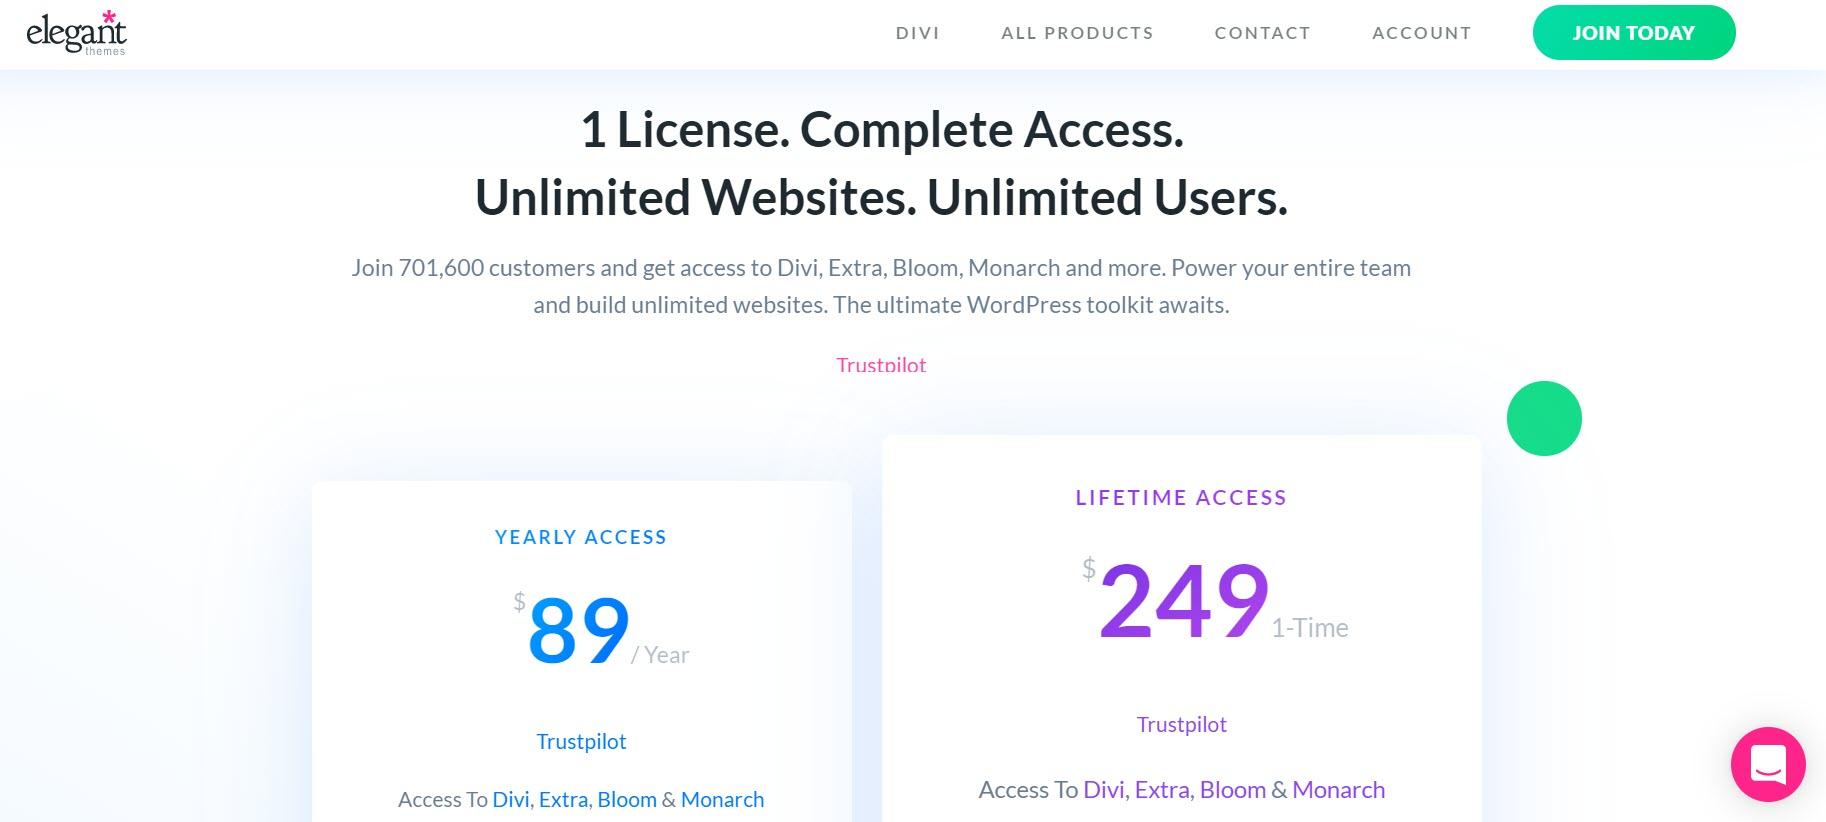 woocommerce免费电子商务插件的实际成本是多少2 WooCommerce有多少? 免费电子商务插件的实际成本